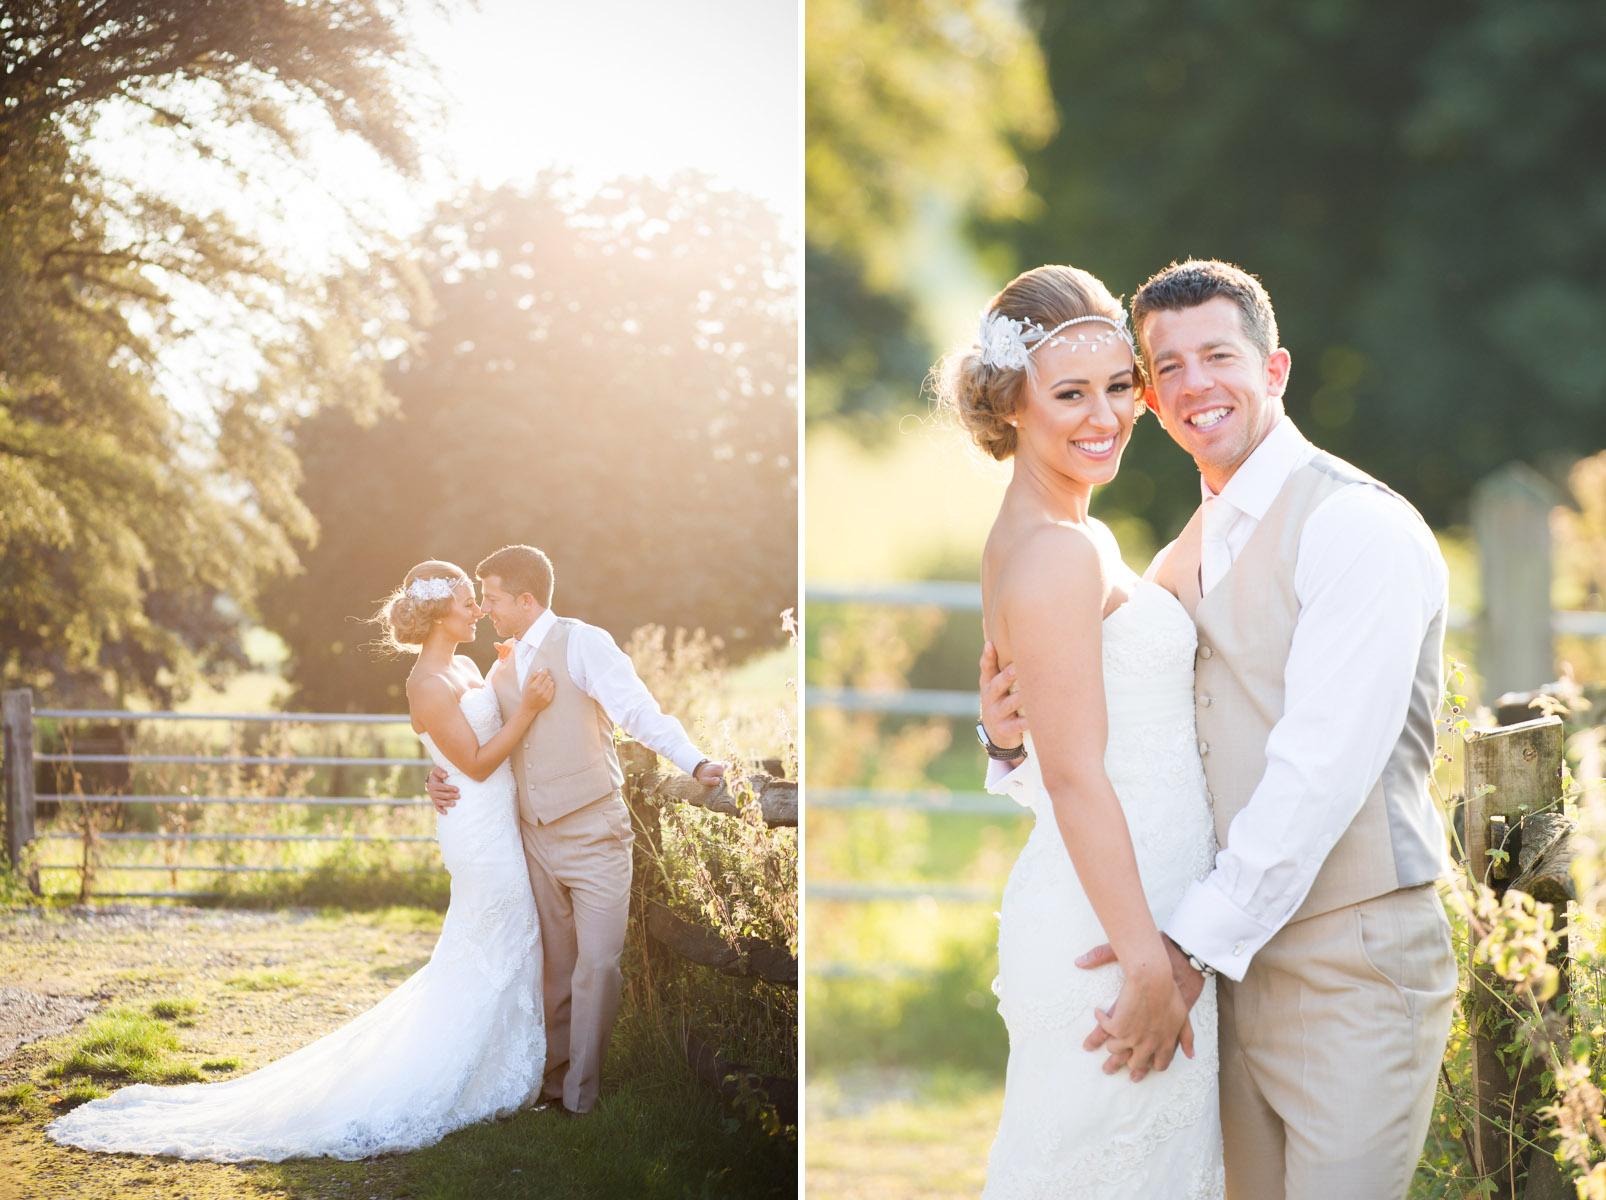 Gaynes Park Wedding - Amy & Darren-78